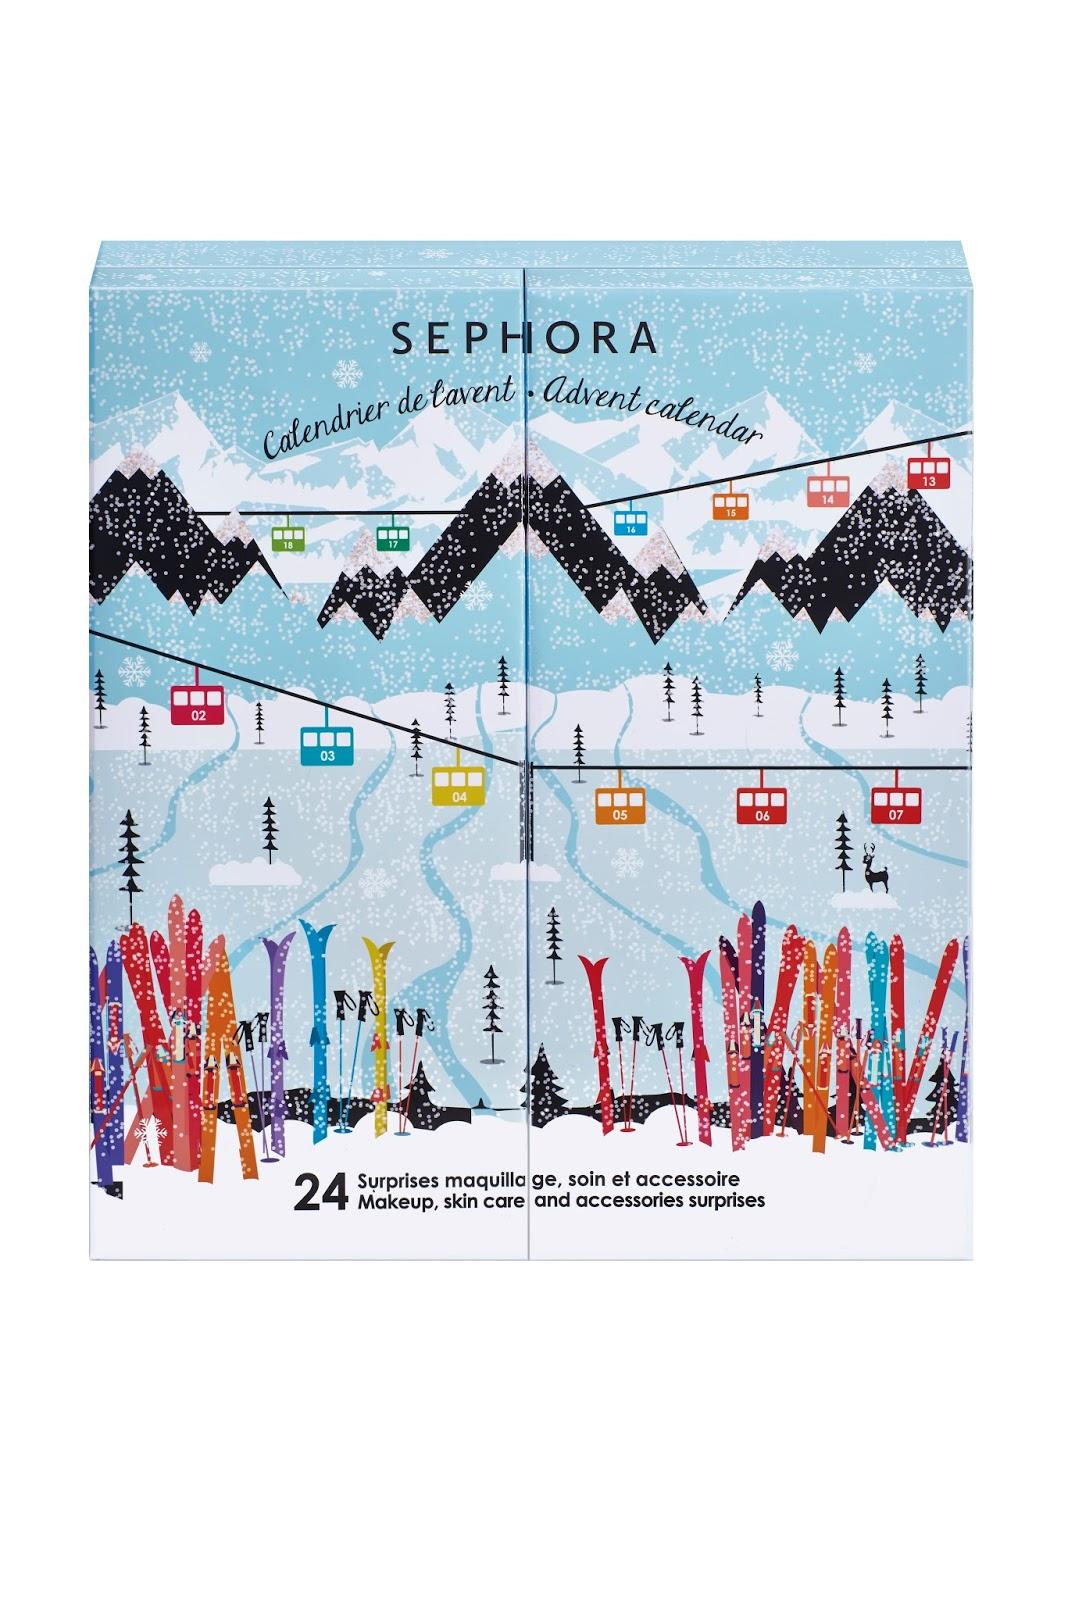 calendrier noel 2018 nocibe De jolis calendriers de l'avent chez Sephora | DAME SKARLETTE calendrier noel 2018 nocibe